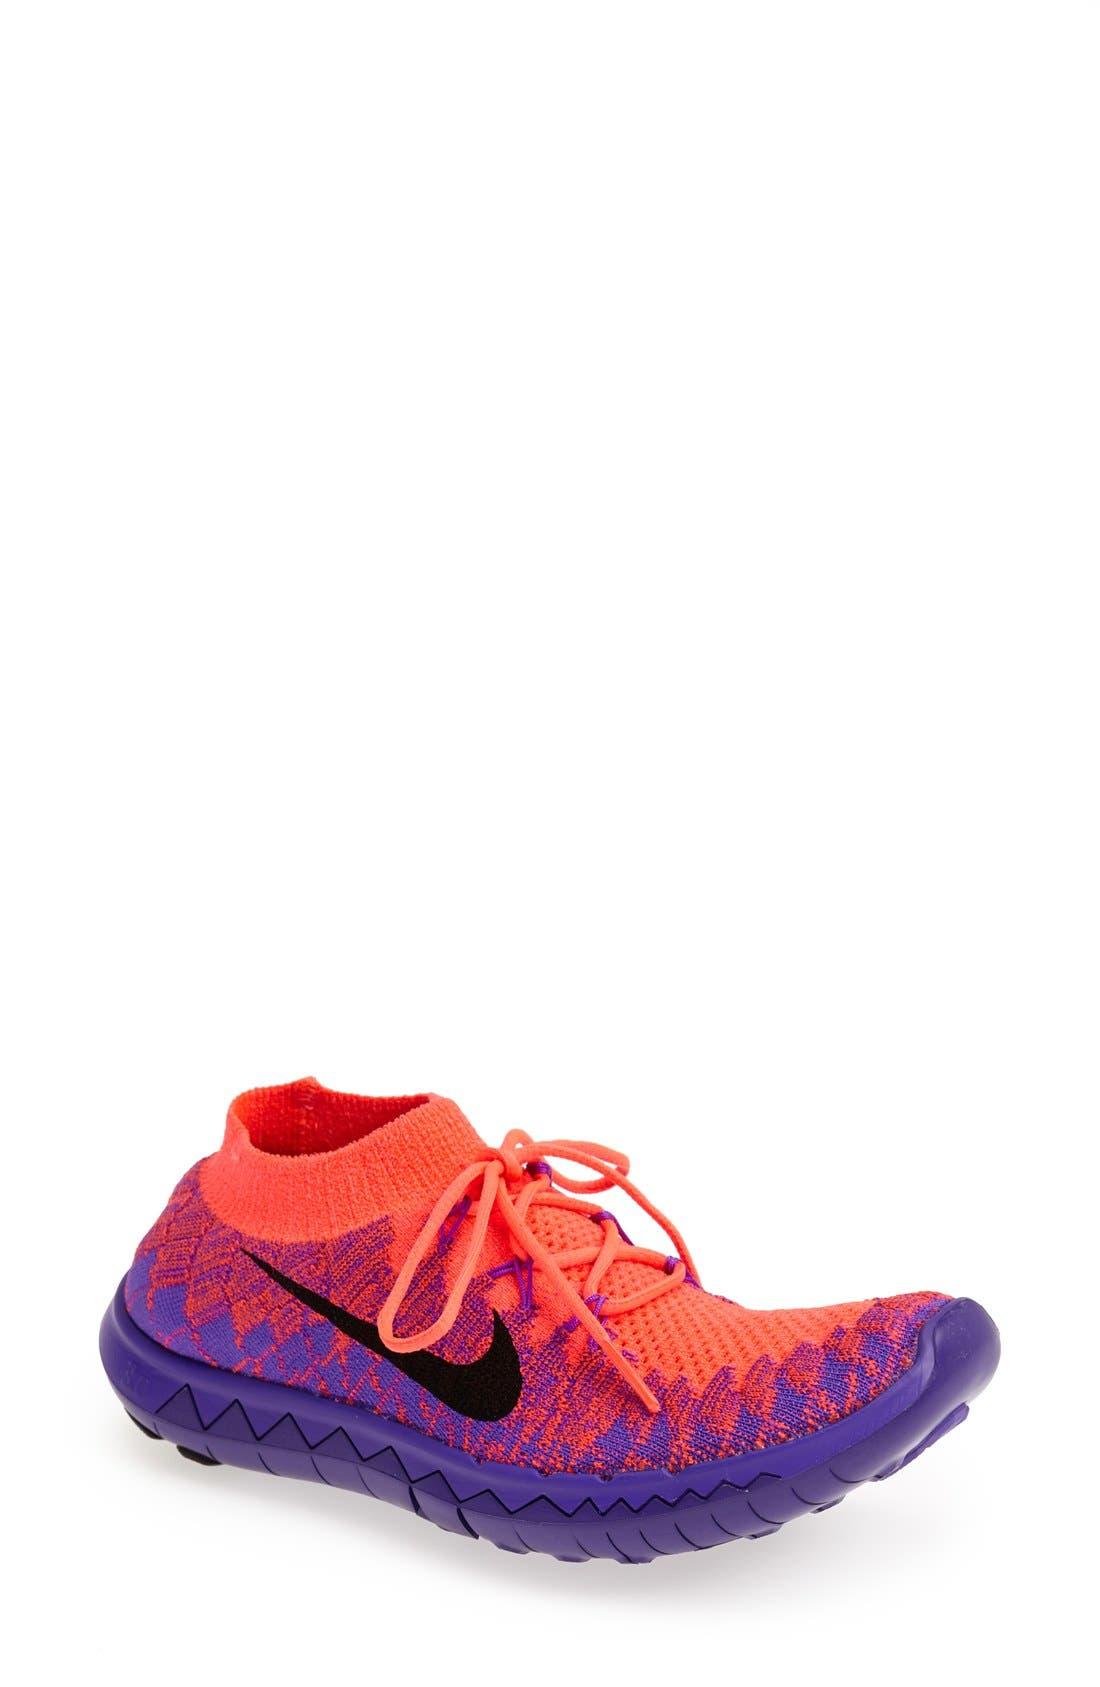 Main Image - Nike 'Free Flyknit 3.0' Running Shoe (Women)